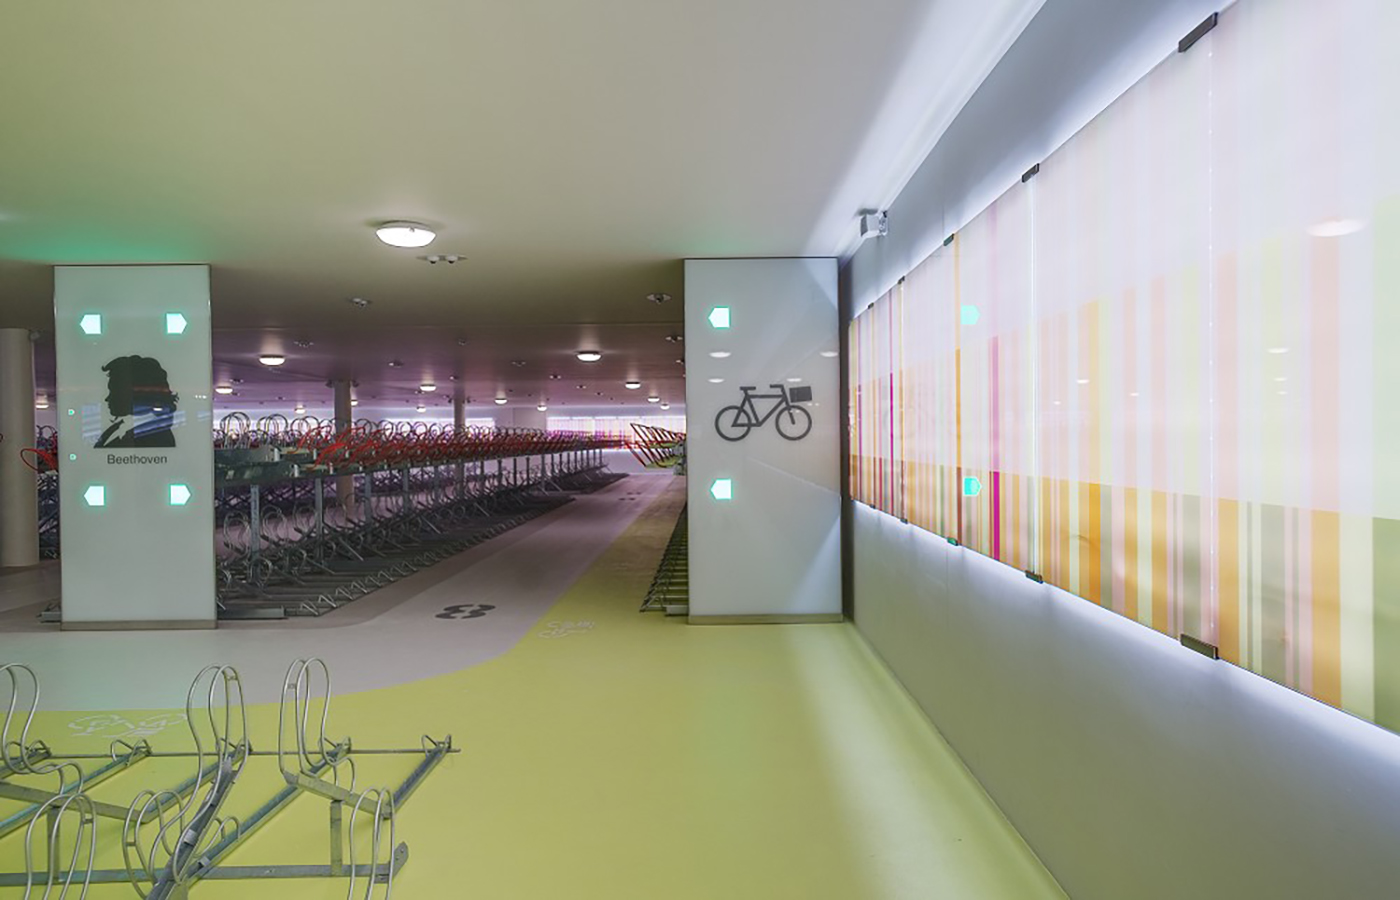 LEDSign project: Fietsenstalling Mahlerplein